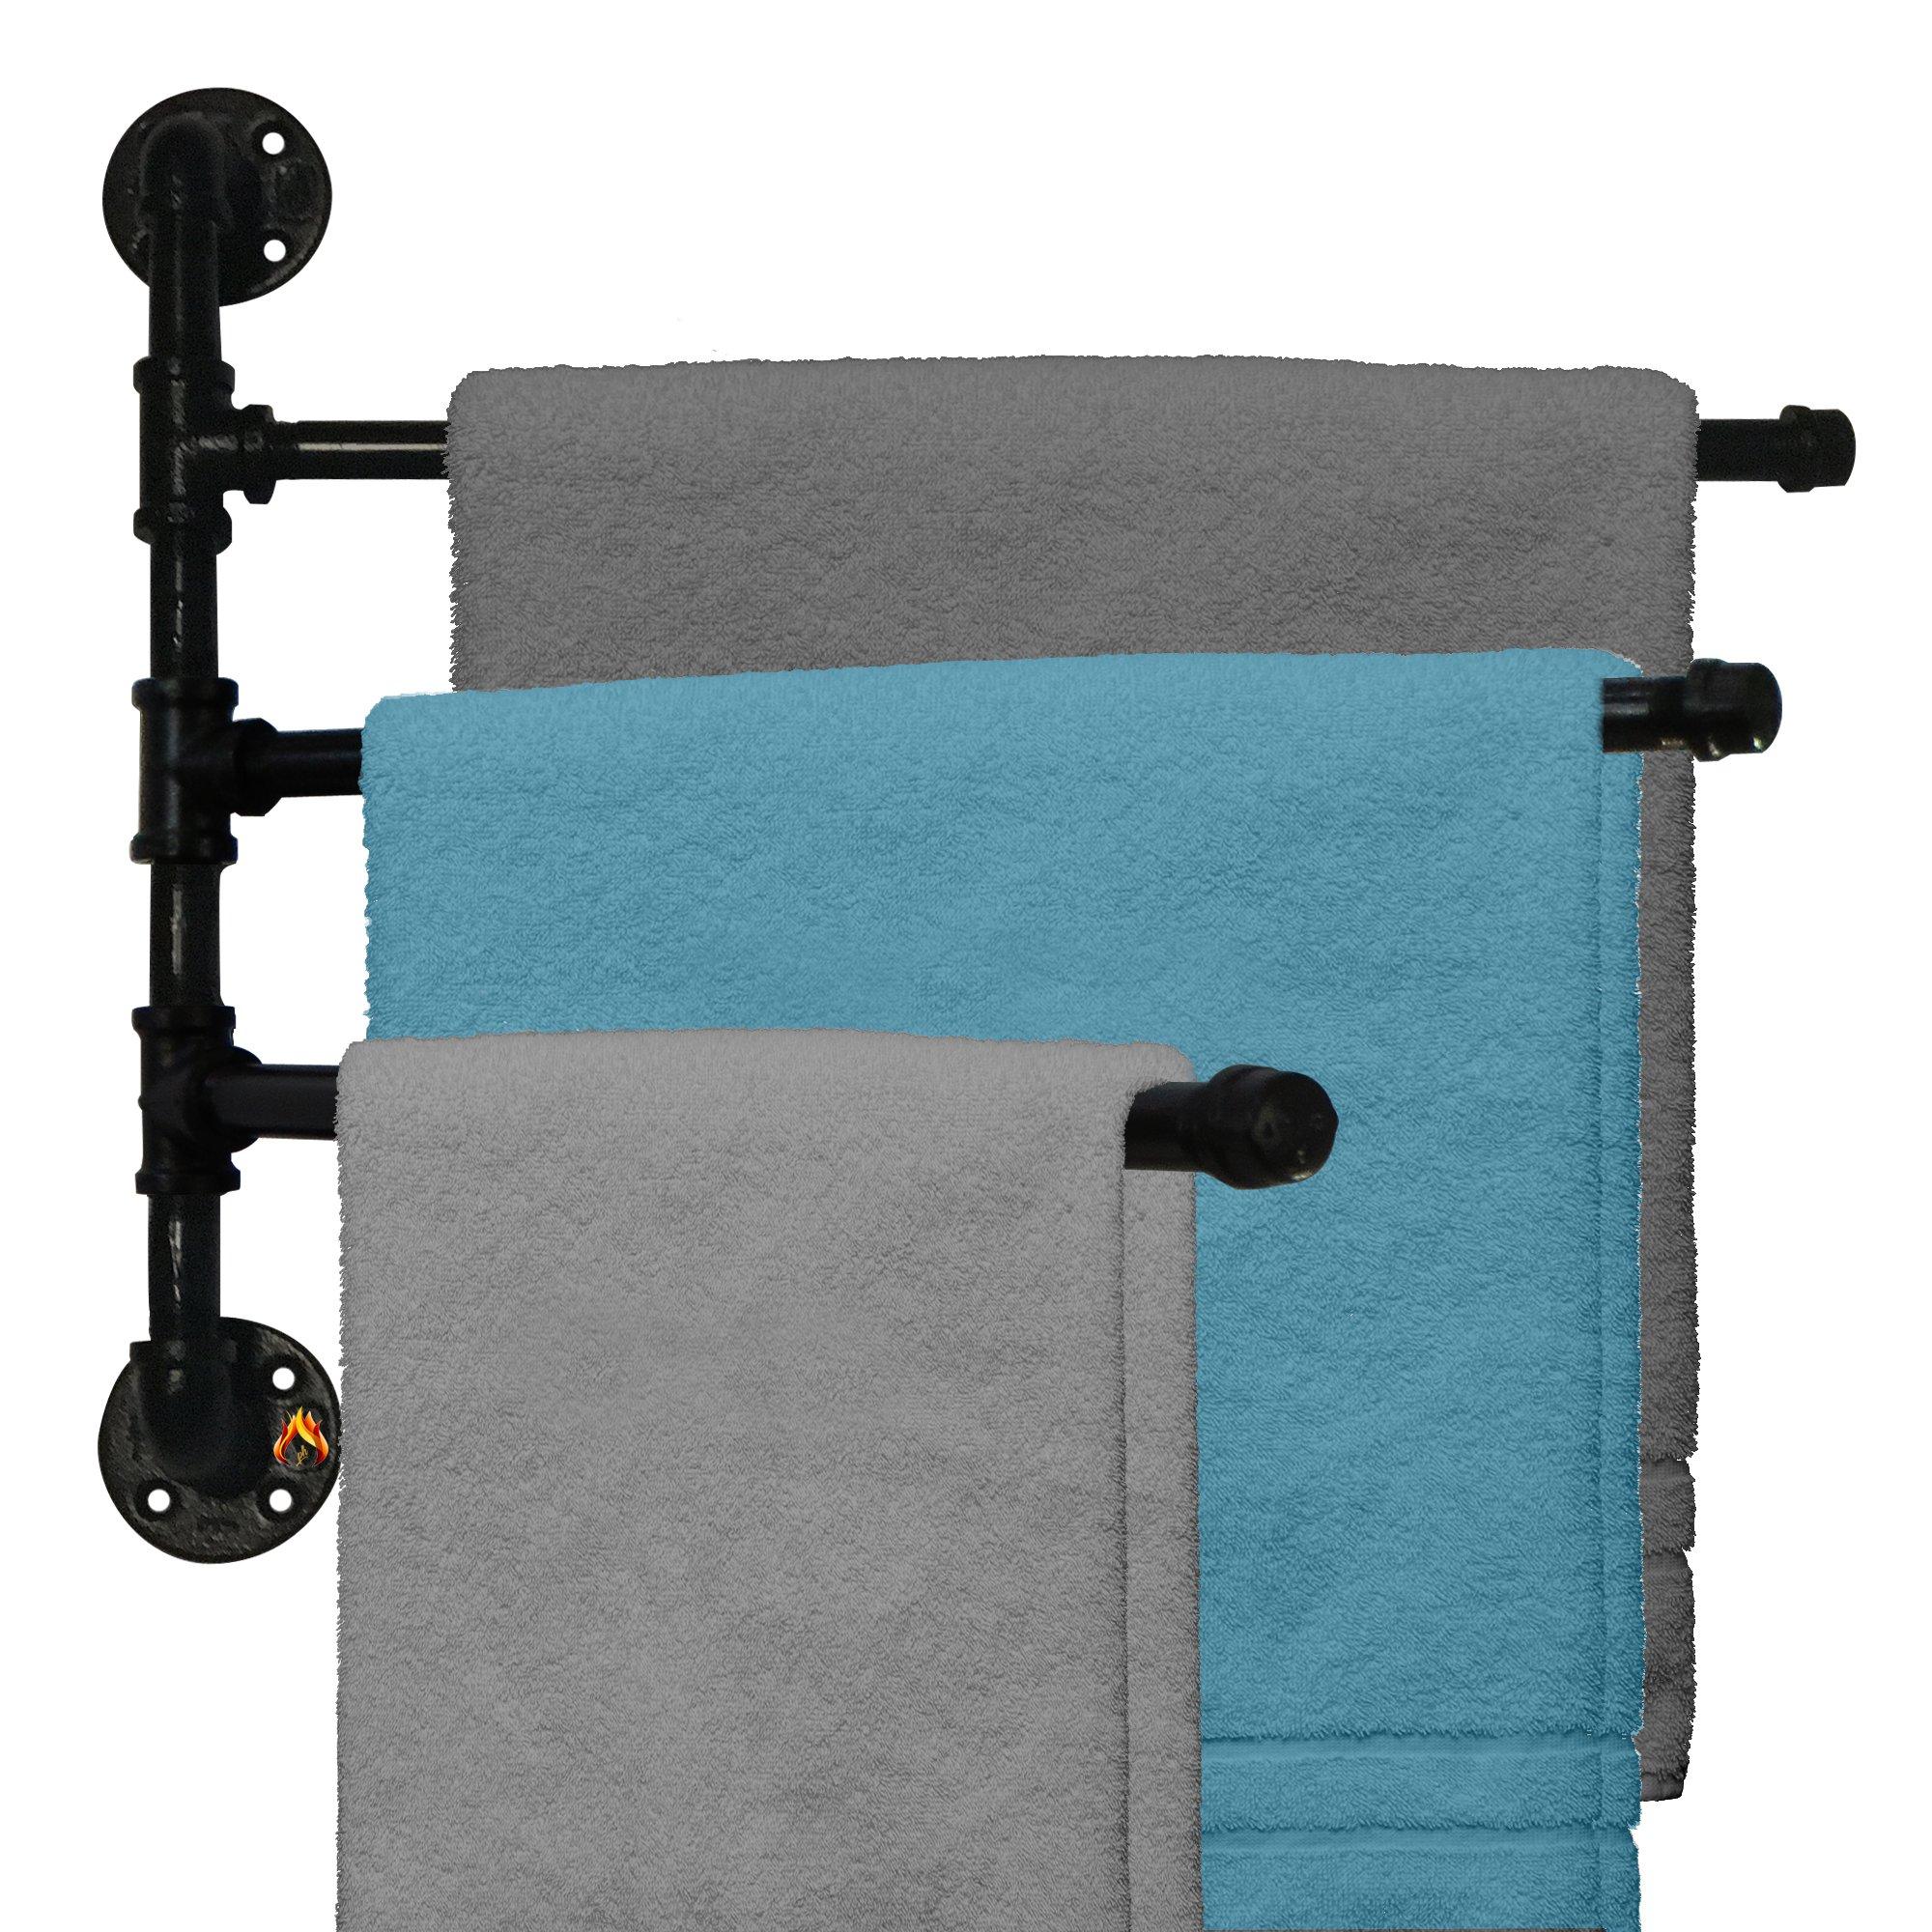 Outdoor Towel Rack For Pool or Bathroom Use - 3 Arm Swivel Towel Rack 20'' - Wall Mounted Towel Holder